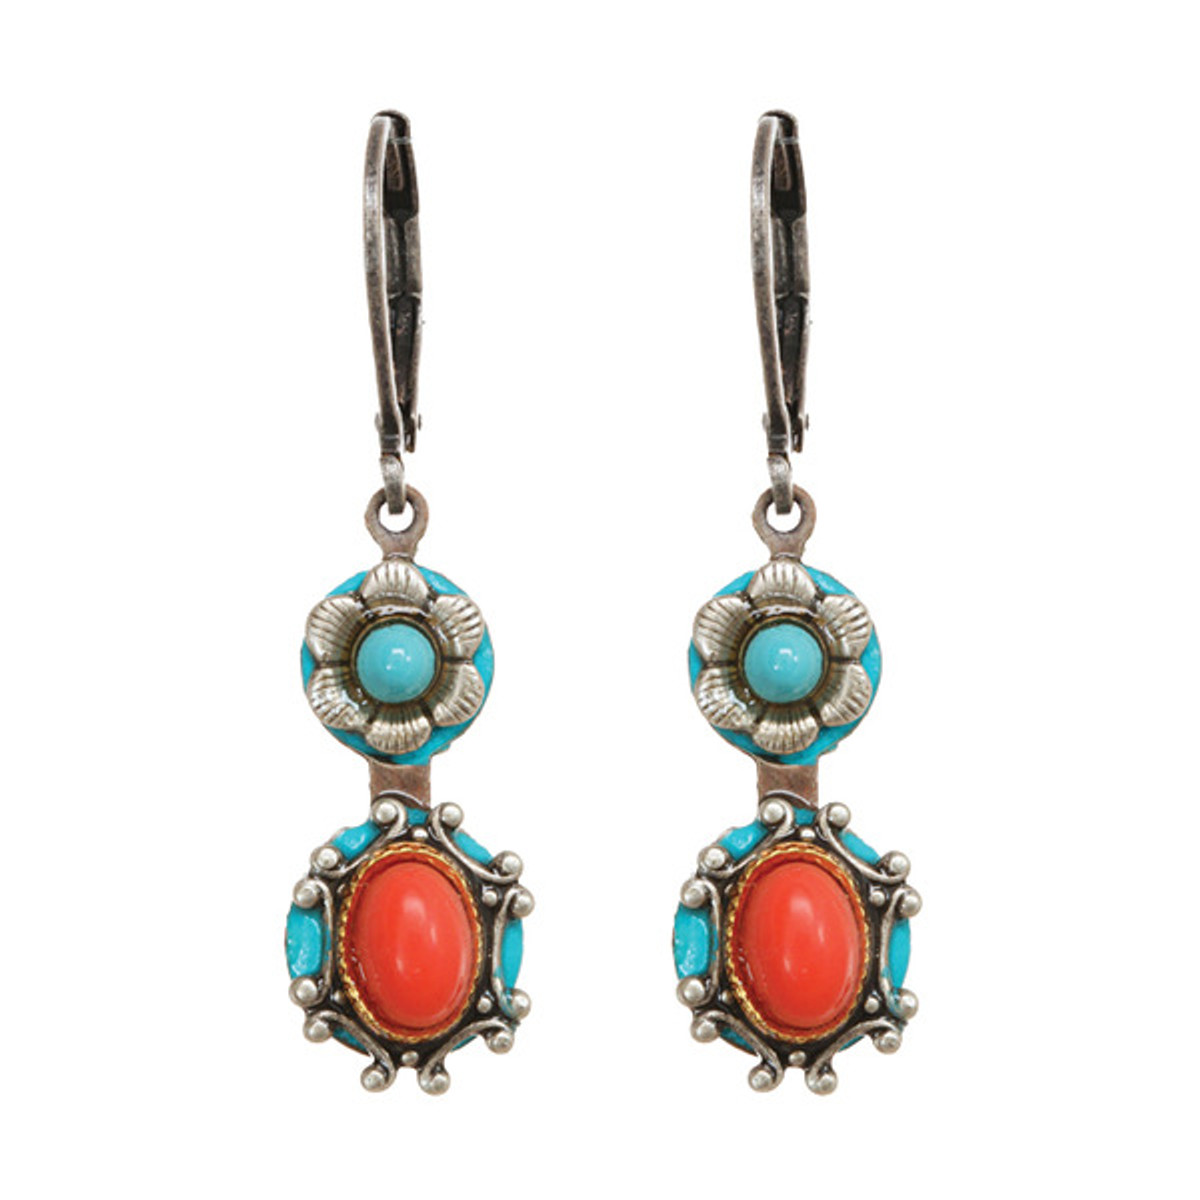 Michal Golan Earrings Coral Sea - S7646